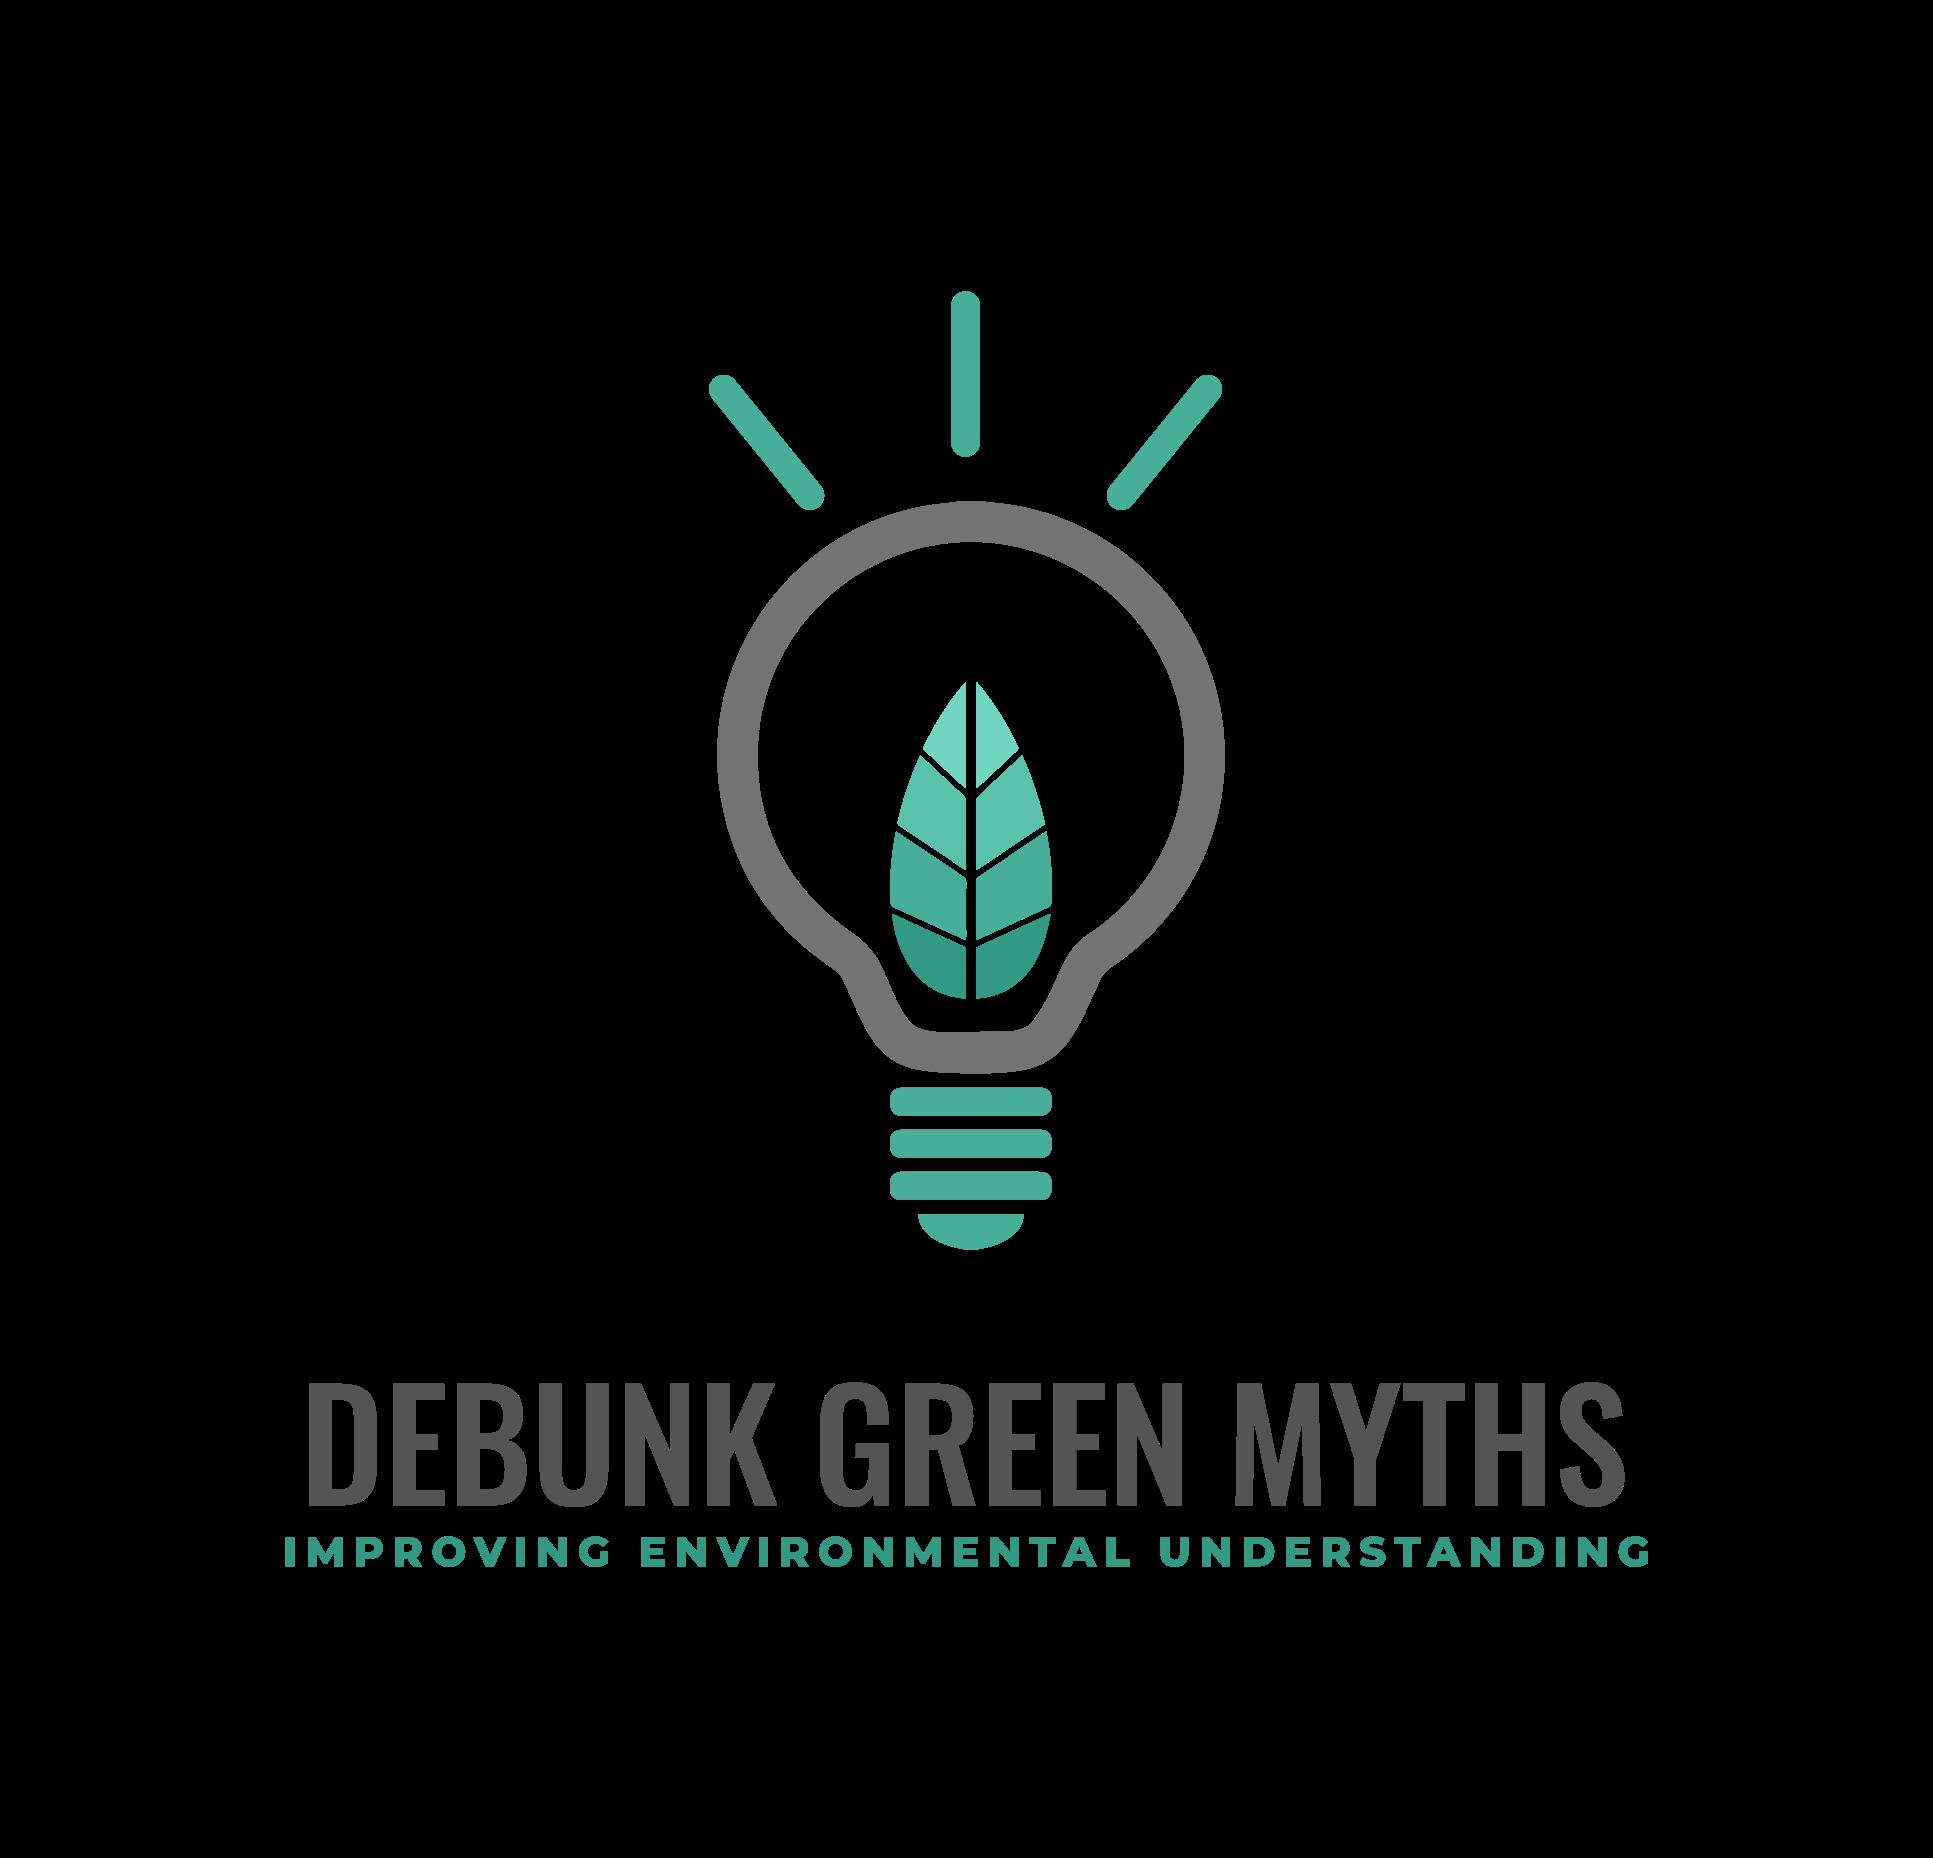 Debunk Green Myths